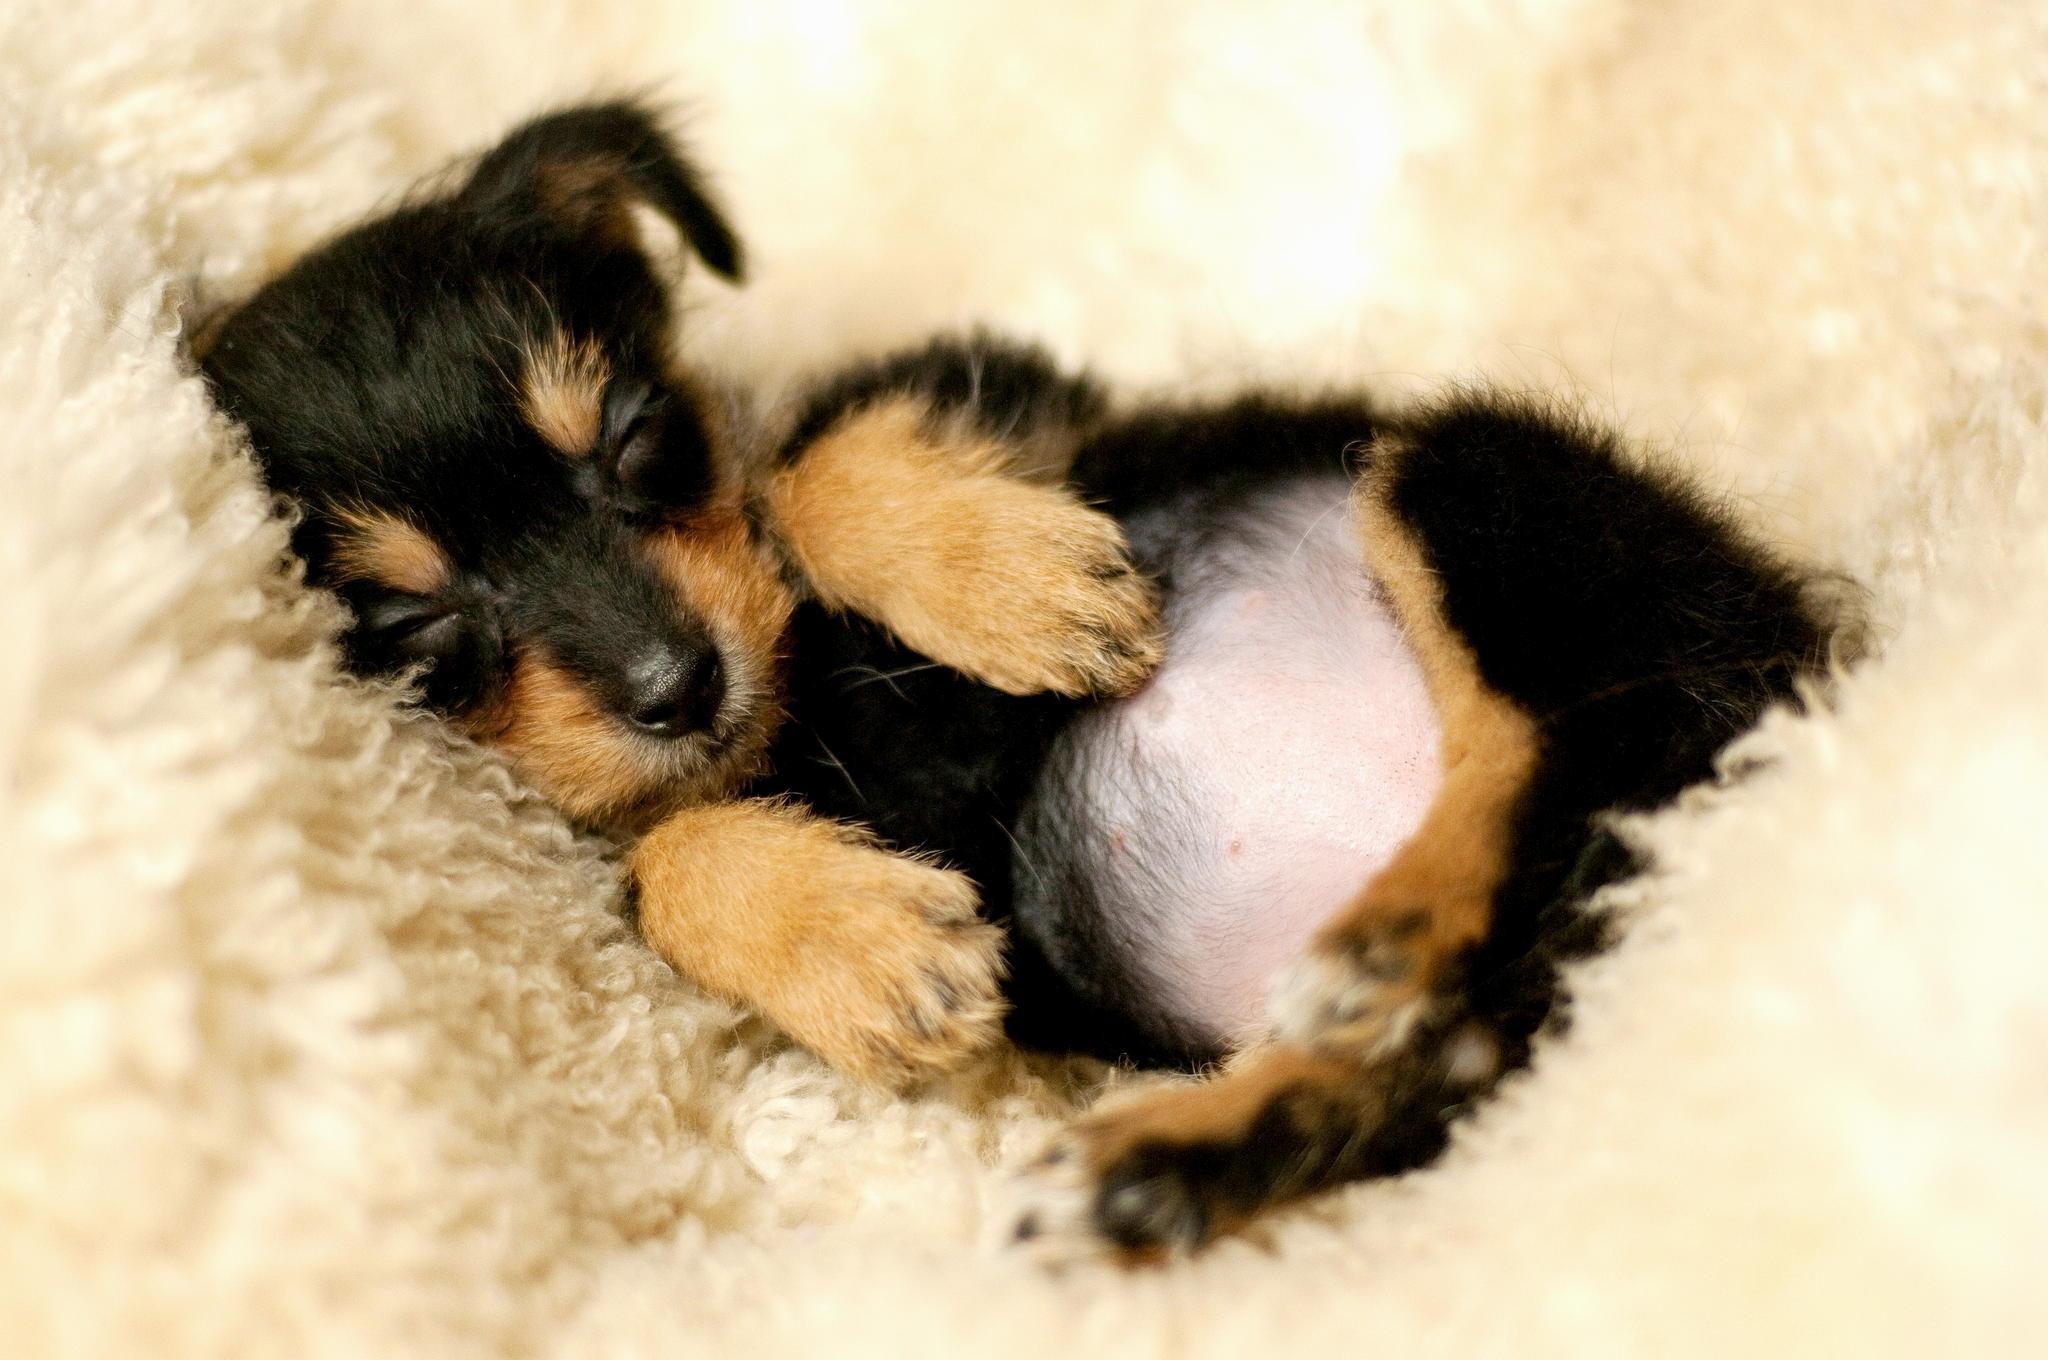 Cute Sleeping Dog Wallpaper 73798 Movieweb